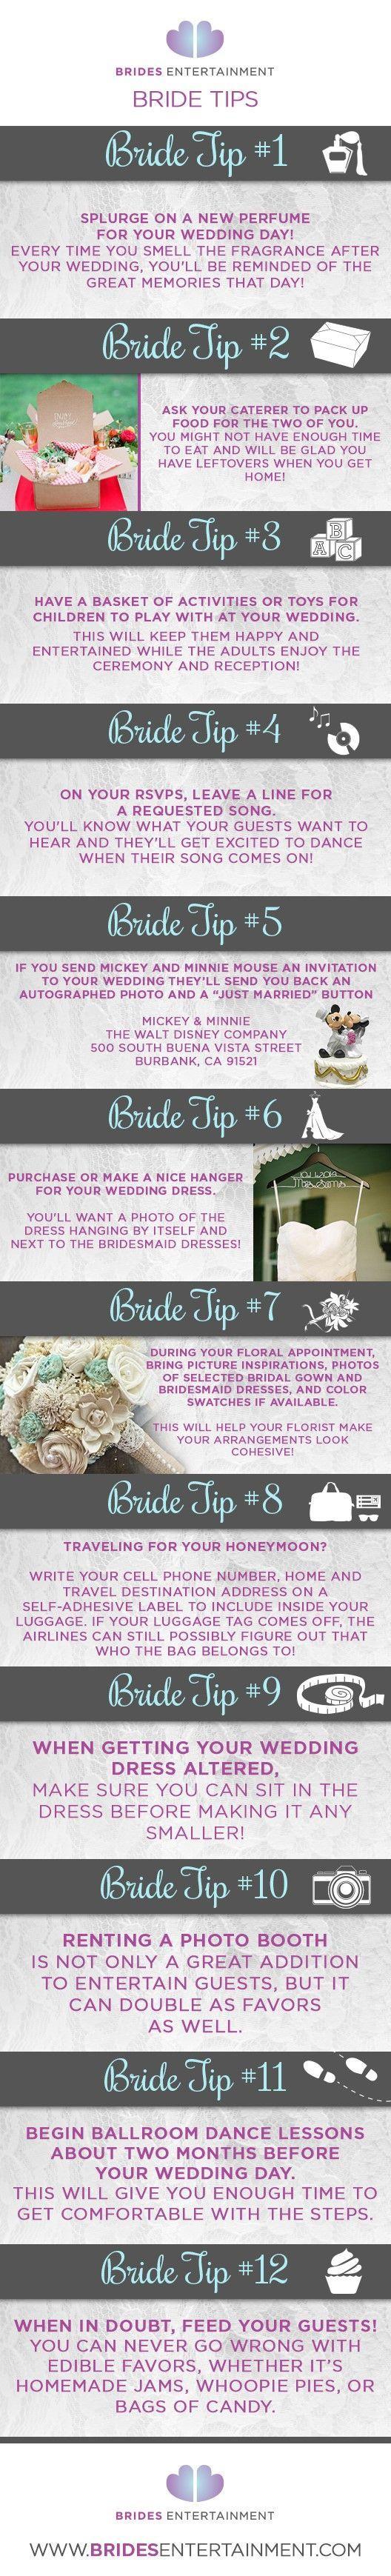 wedding planning tips best photos - wedding planning  - cuteweddingideas.com